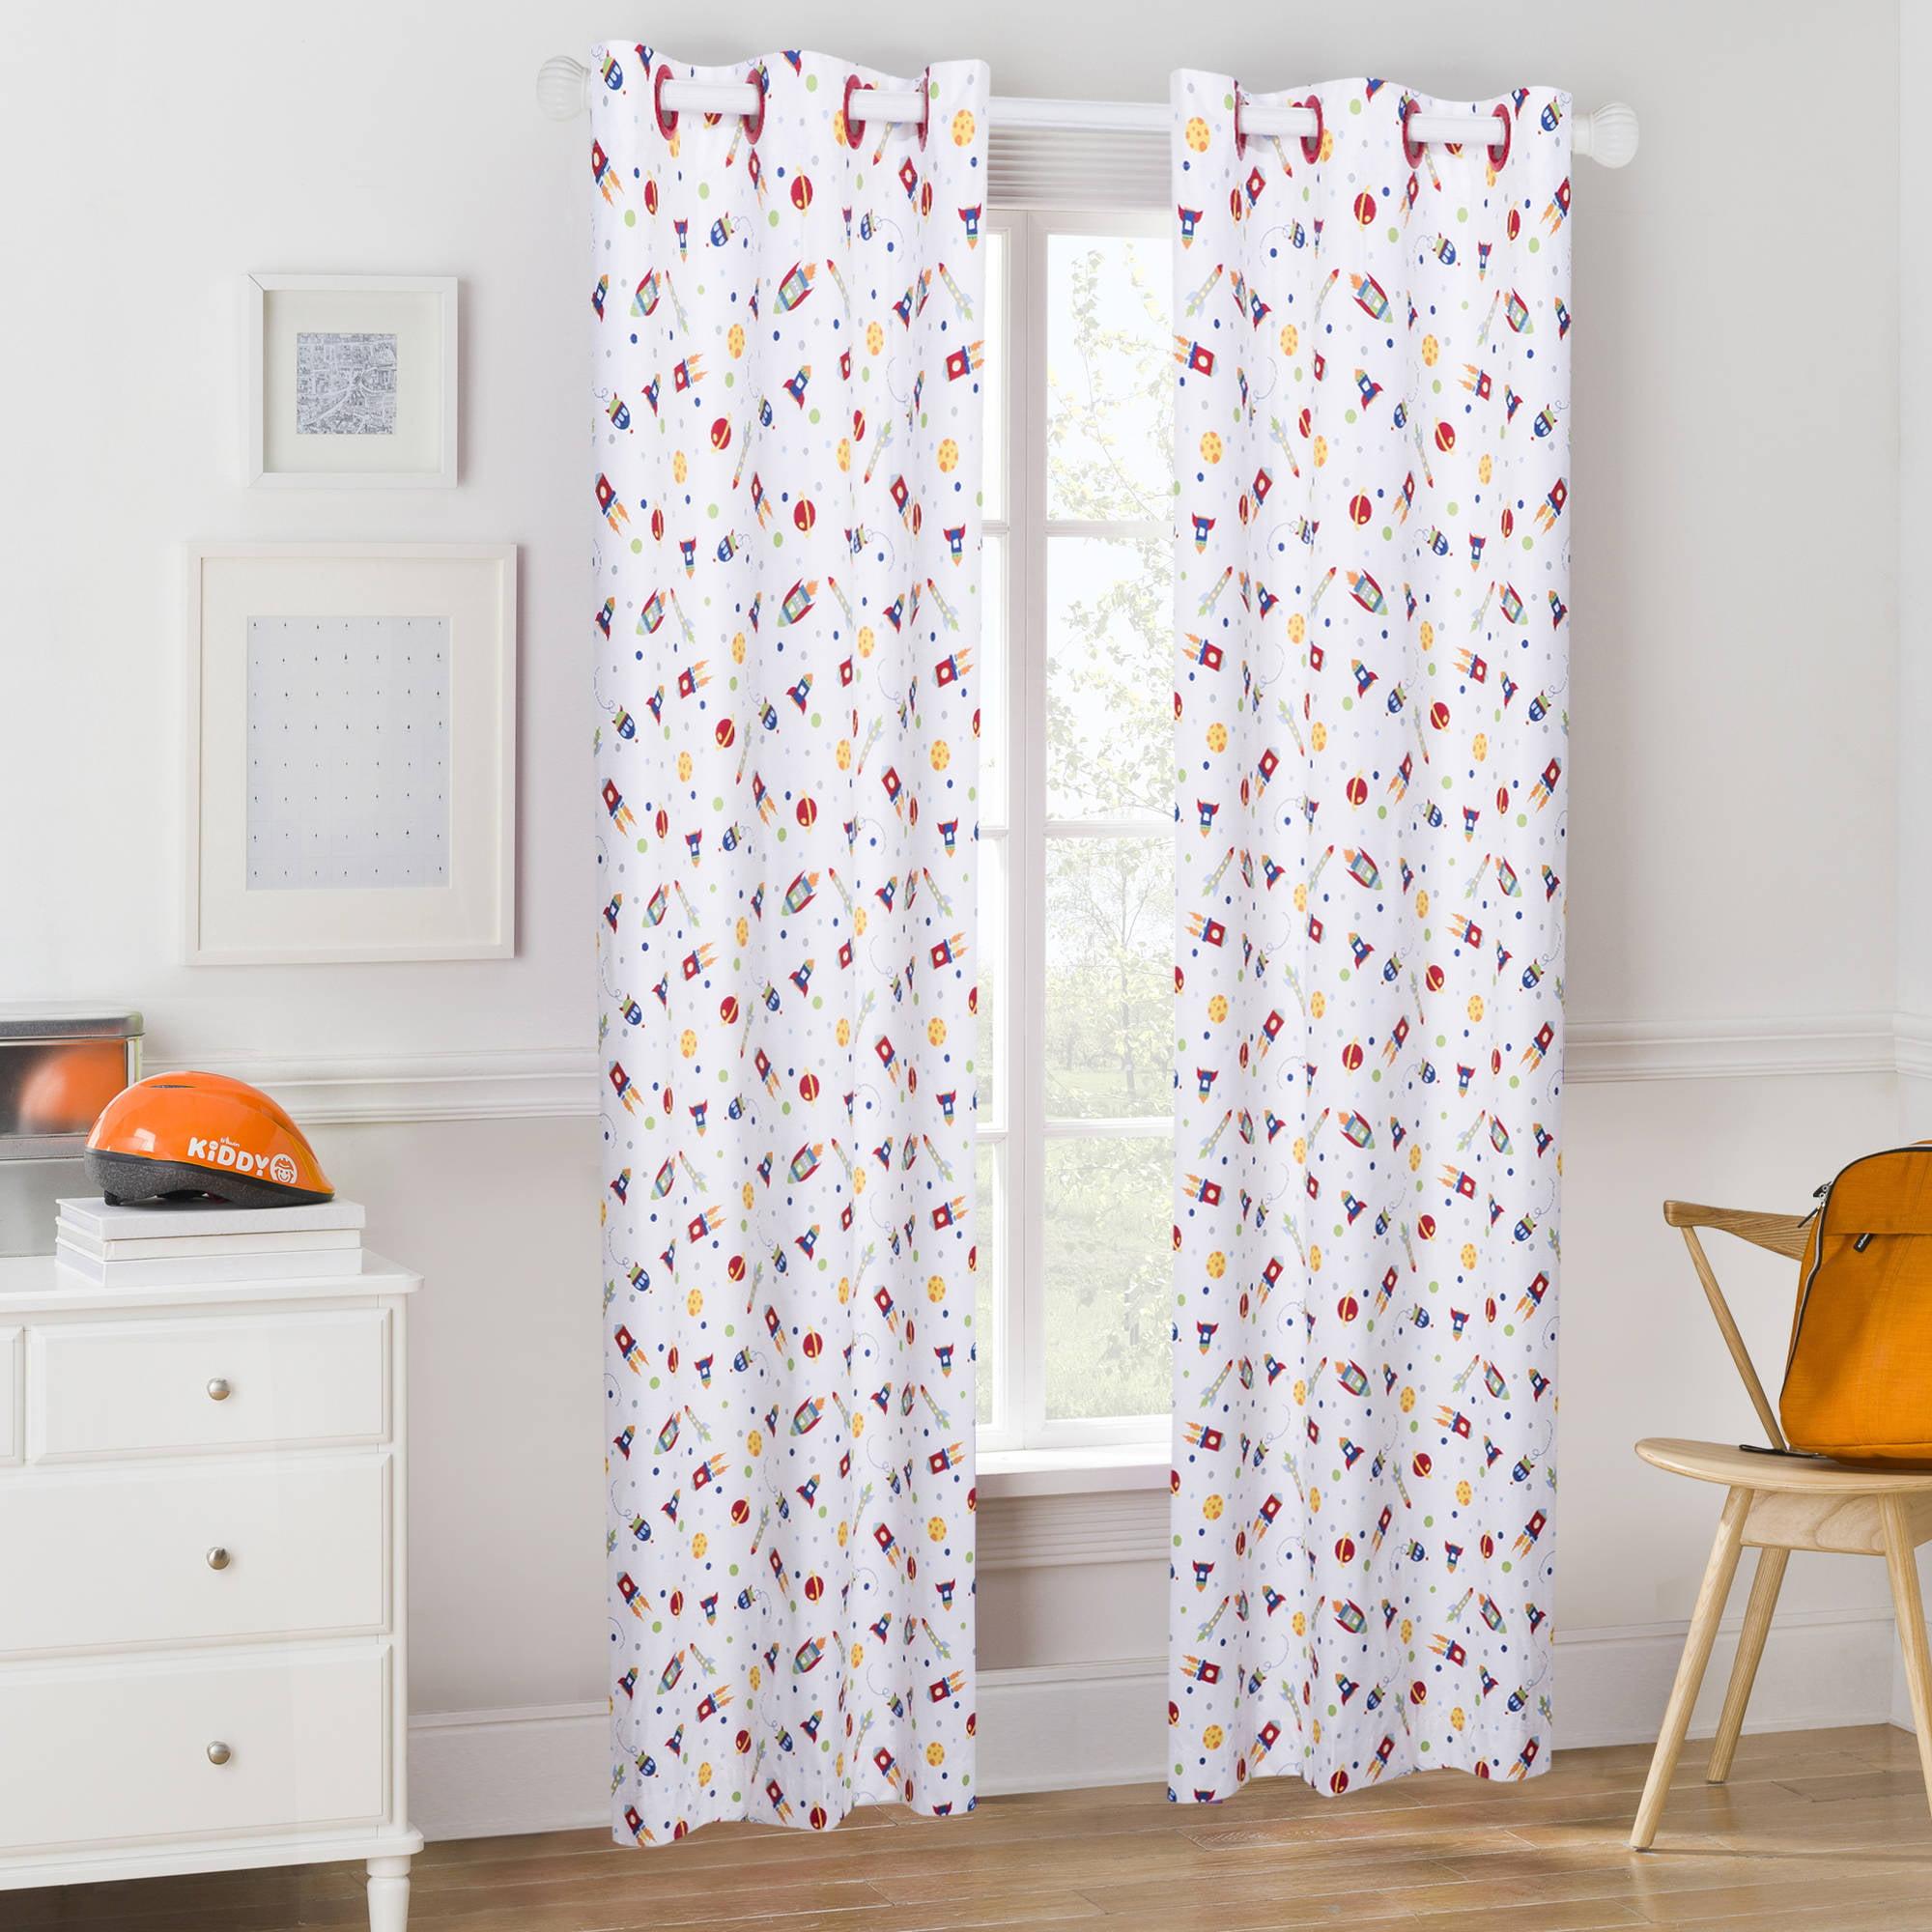 Mainstays Kids Rockets Room Darkening Coordinating Window Curtain